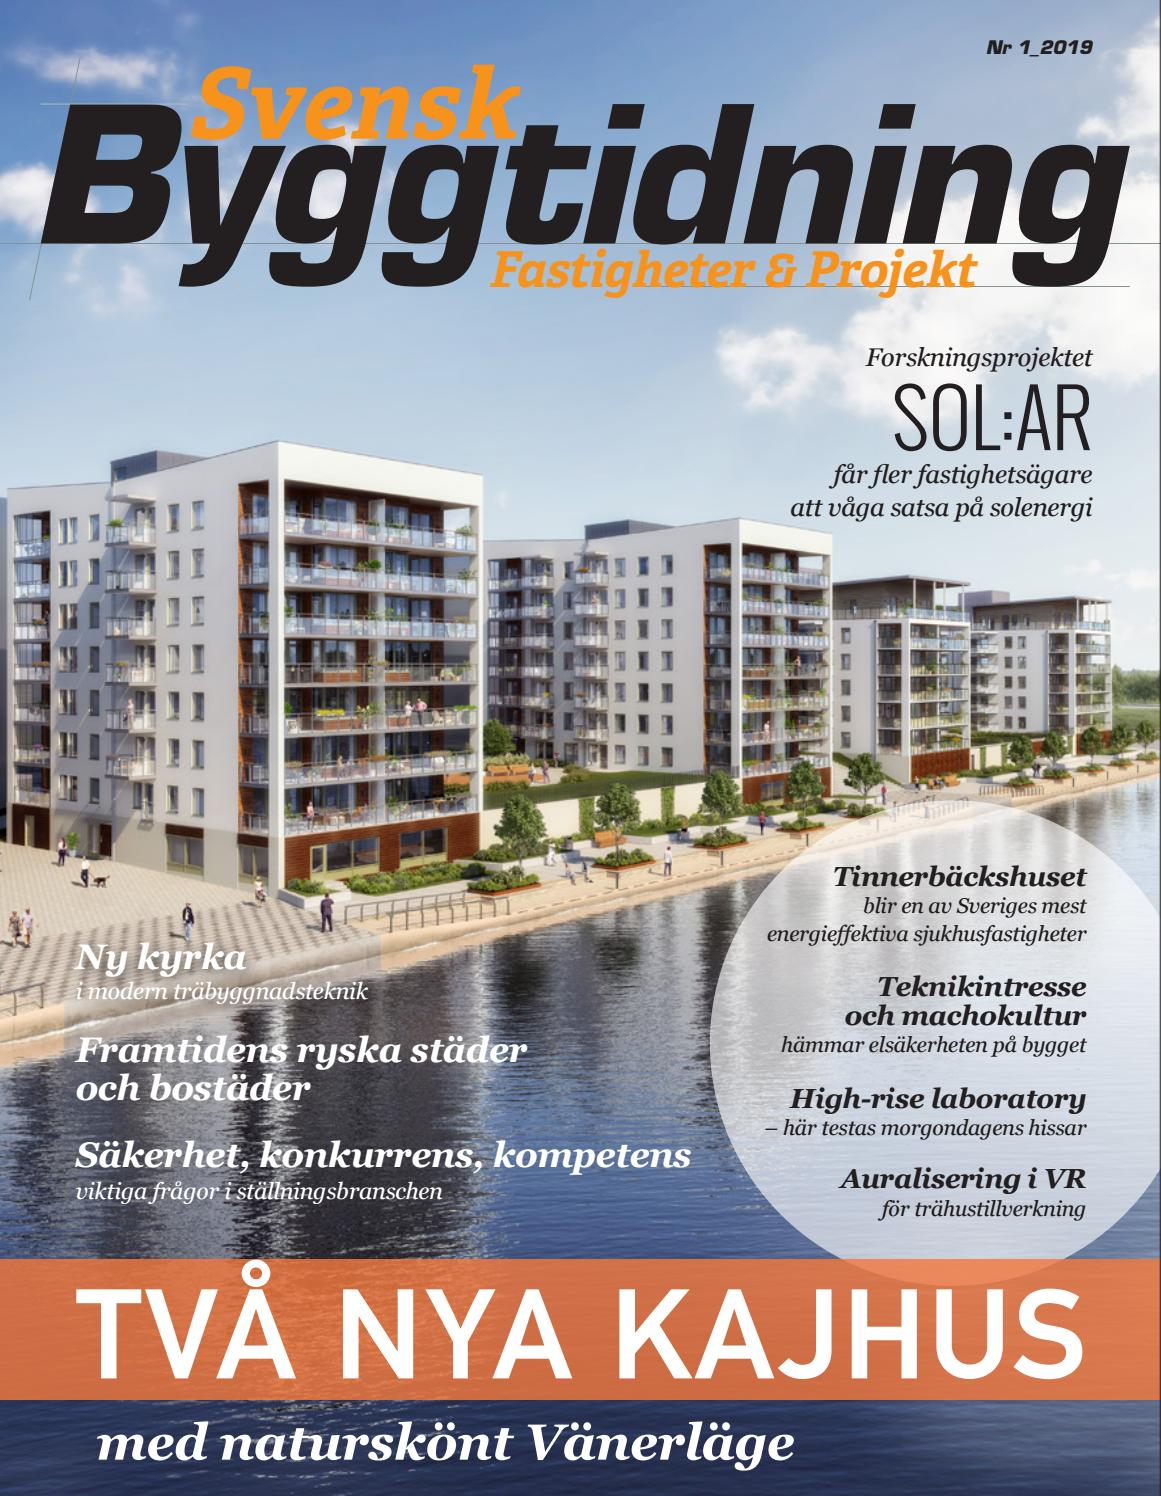 Svensk Byggtidning 1 2019 by Stordåhd Kommunikation AB - issuu 49e175e8b18b9